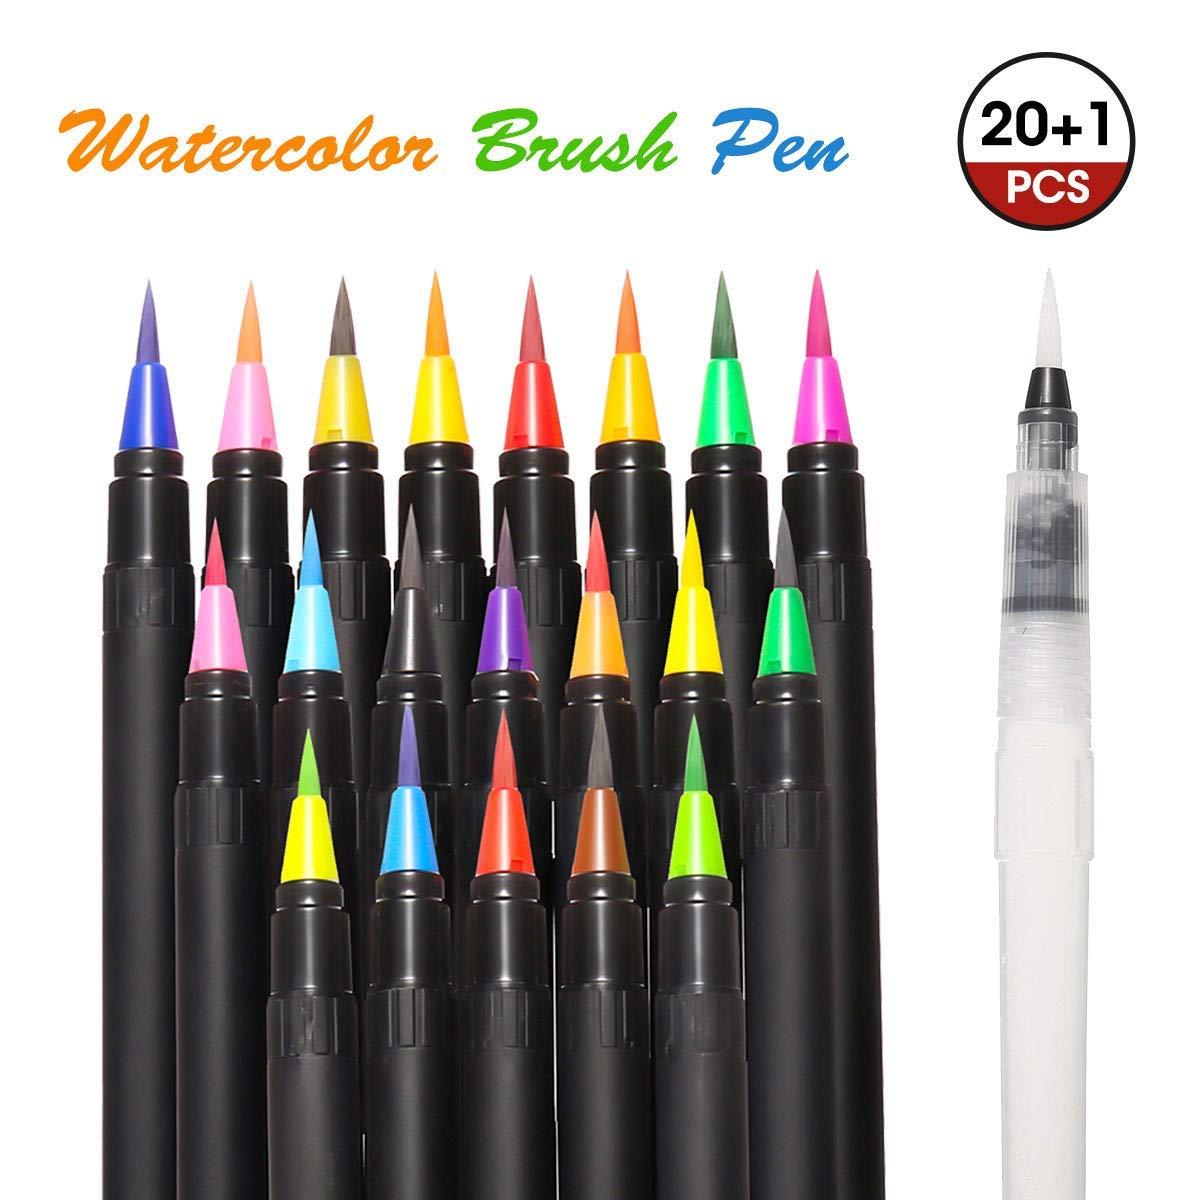 Watercolor Brush Pens ARTISTORE 21pcs (20 Colors+1 Water Brush Pen), Watercolor Brush Markers, Vibrant Colors Painting Brush Soft Flexible Tip for Kids Adult Coloring Books Calligraphy Manga Art Comic